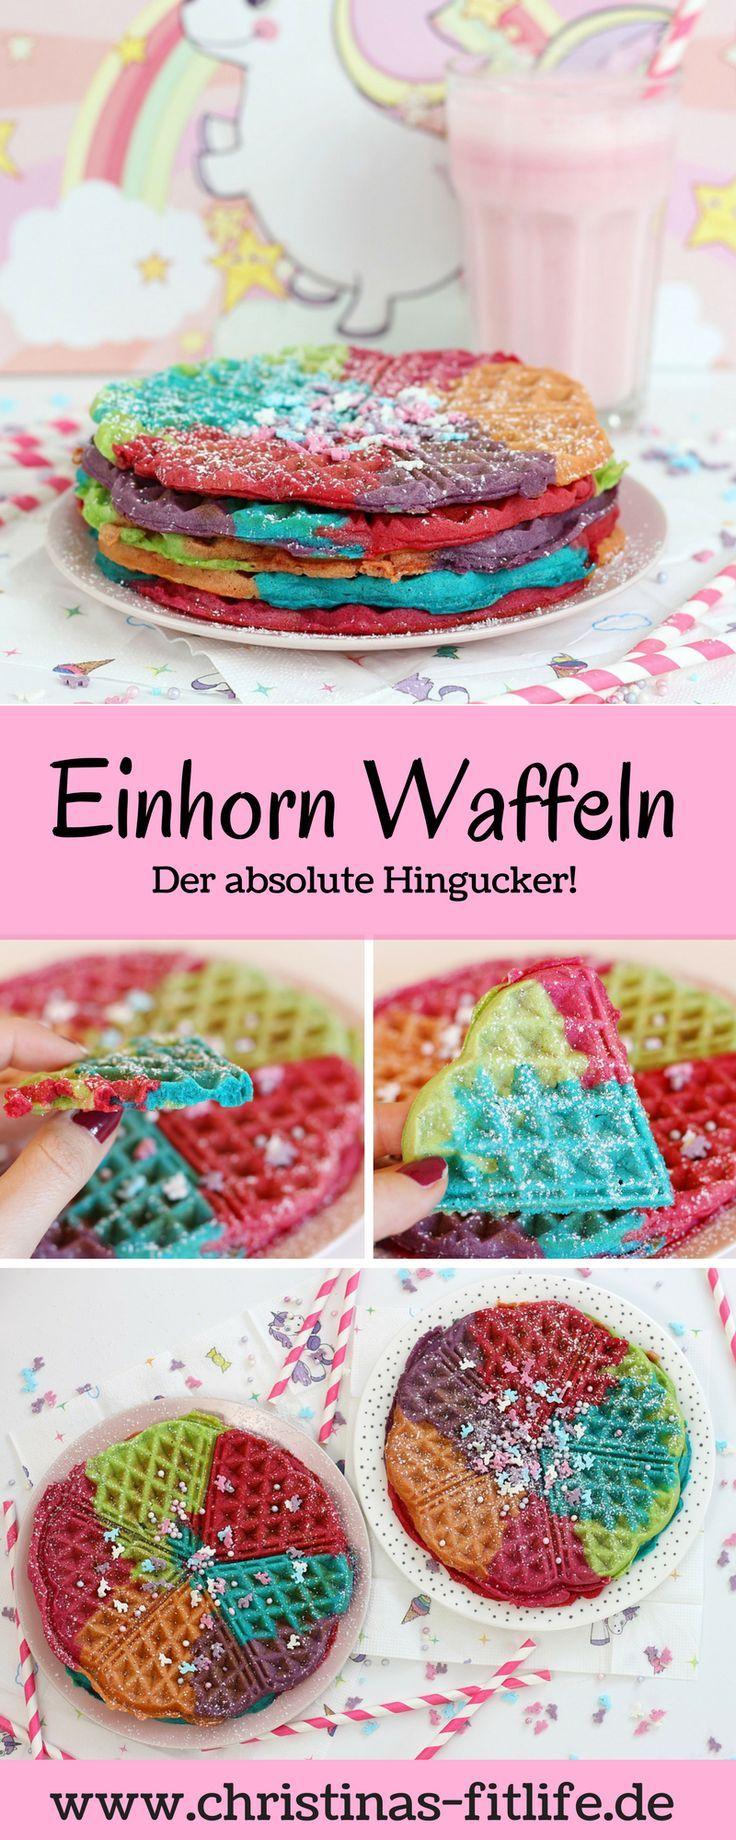 ᐅ Einhorn Waffeln – der absolute Hingucker! I Rezepte by Christina – Christin Löhner